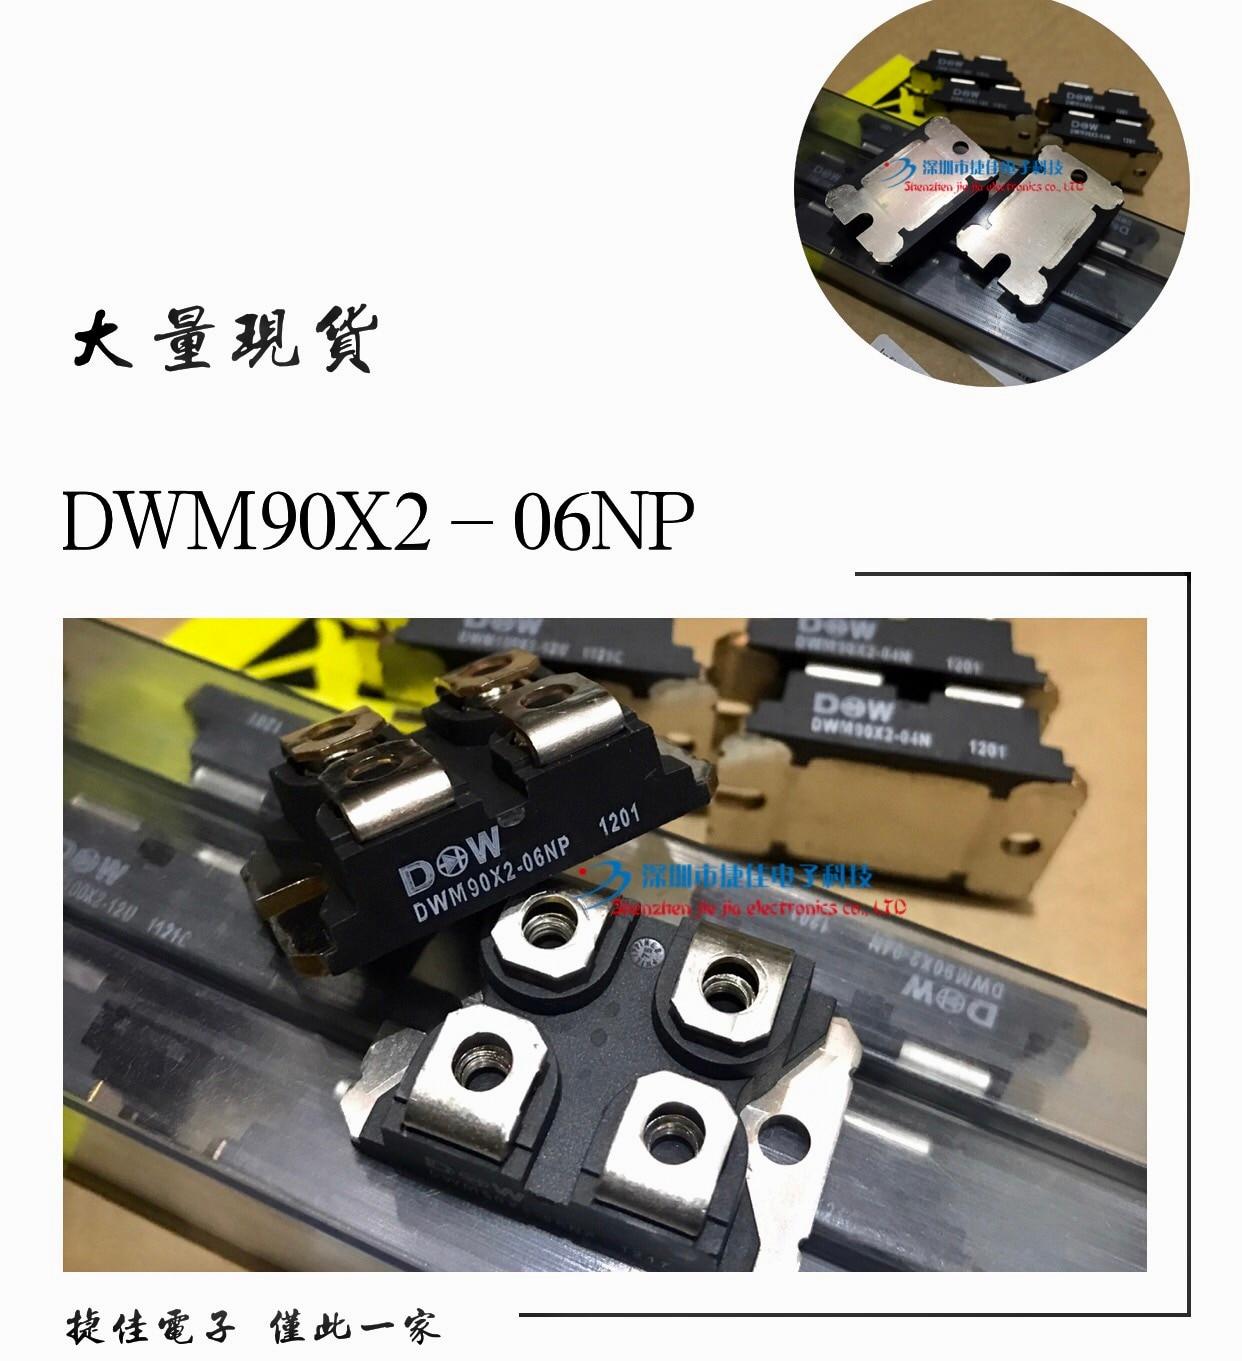 DWM90X2-06N/06NP DWM60X2-12N DWM100X2-04N DWM120X2-03 DWM2F1